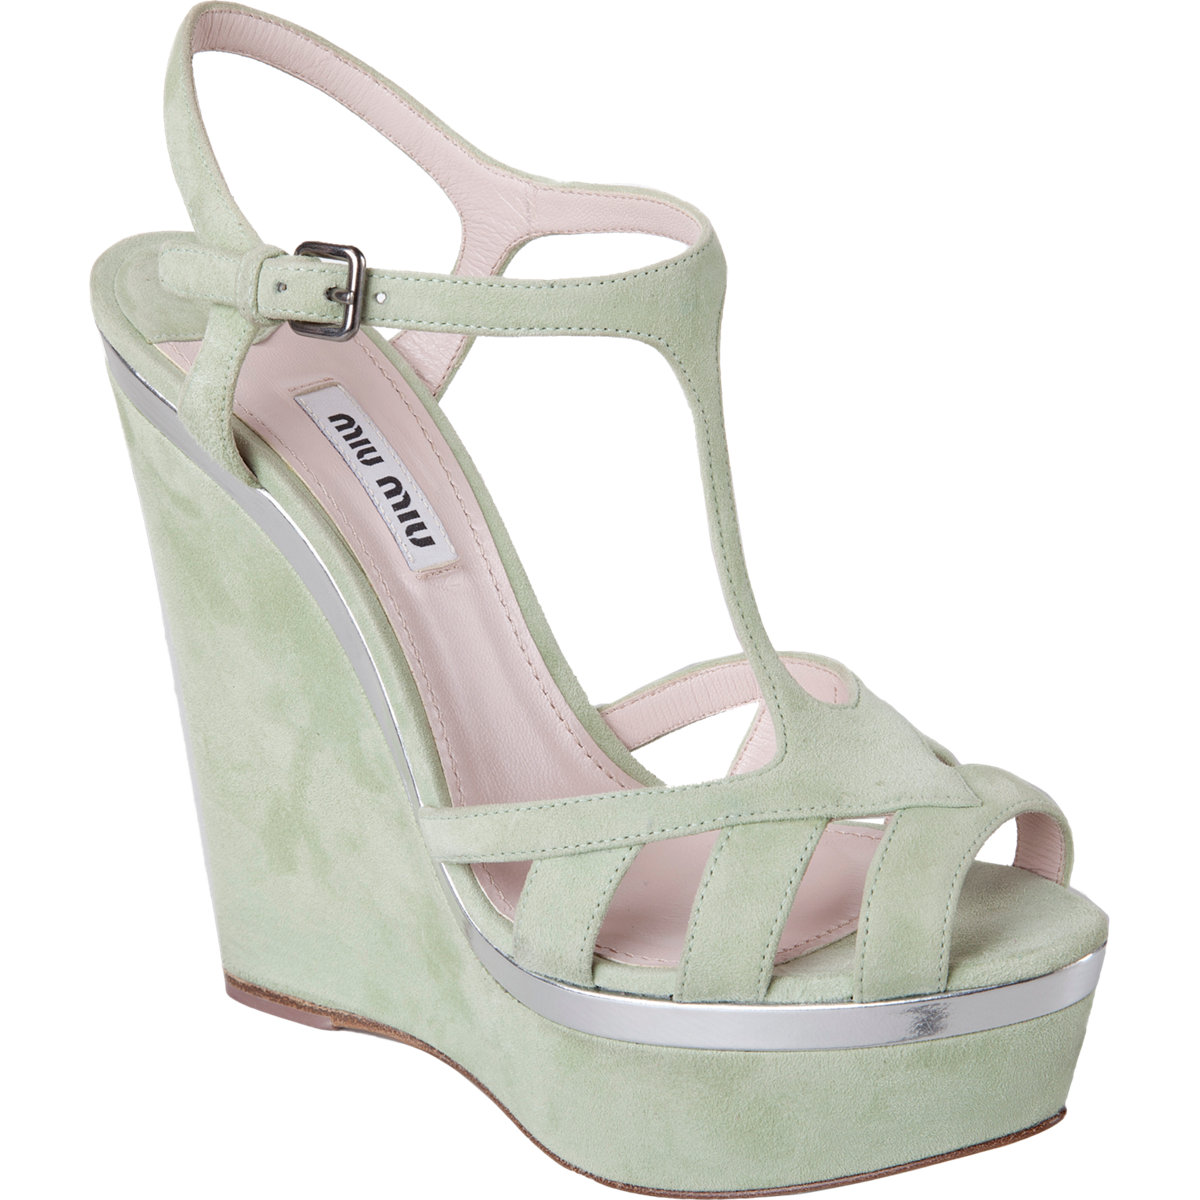 c059cd0b934 Shoeniverse  MIU MIU Mint   Silver Tstrap Platform Wedge Sandal